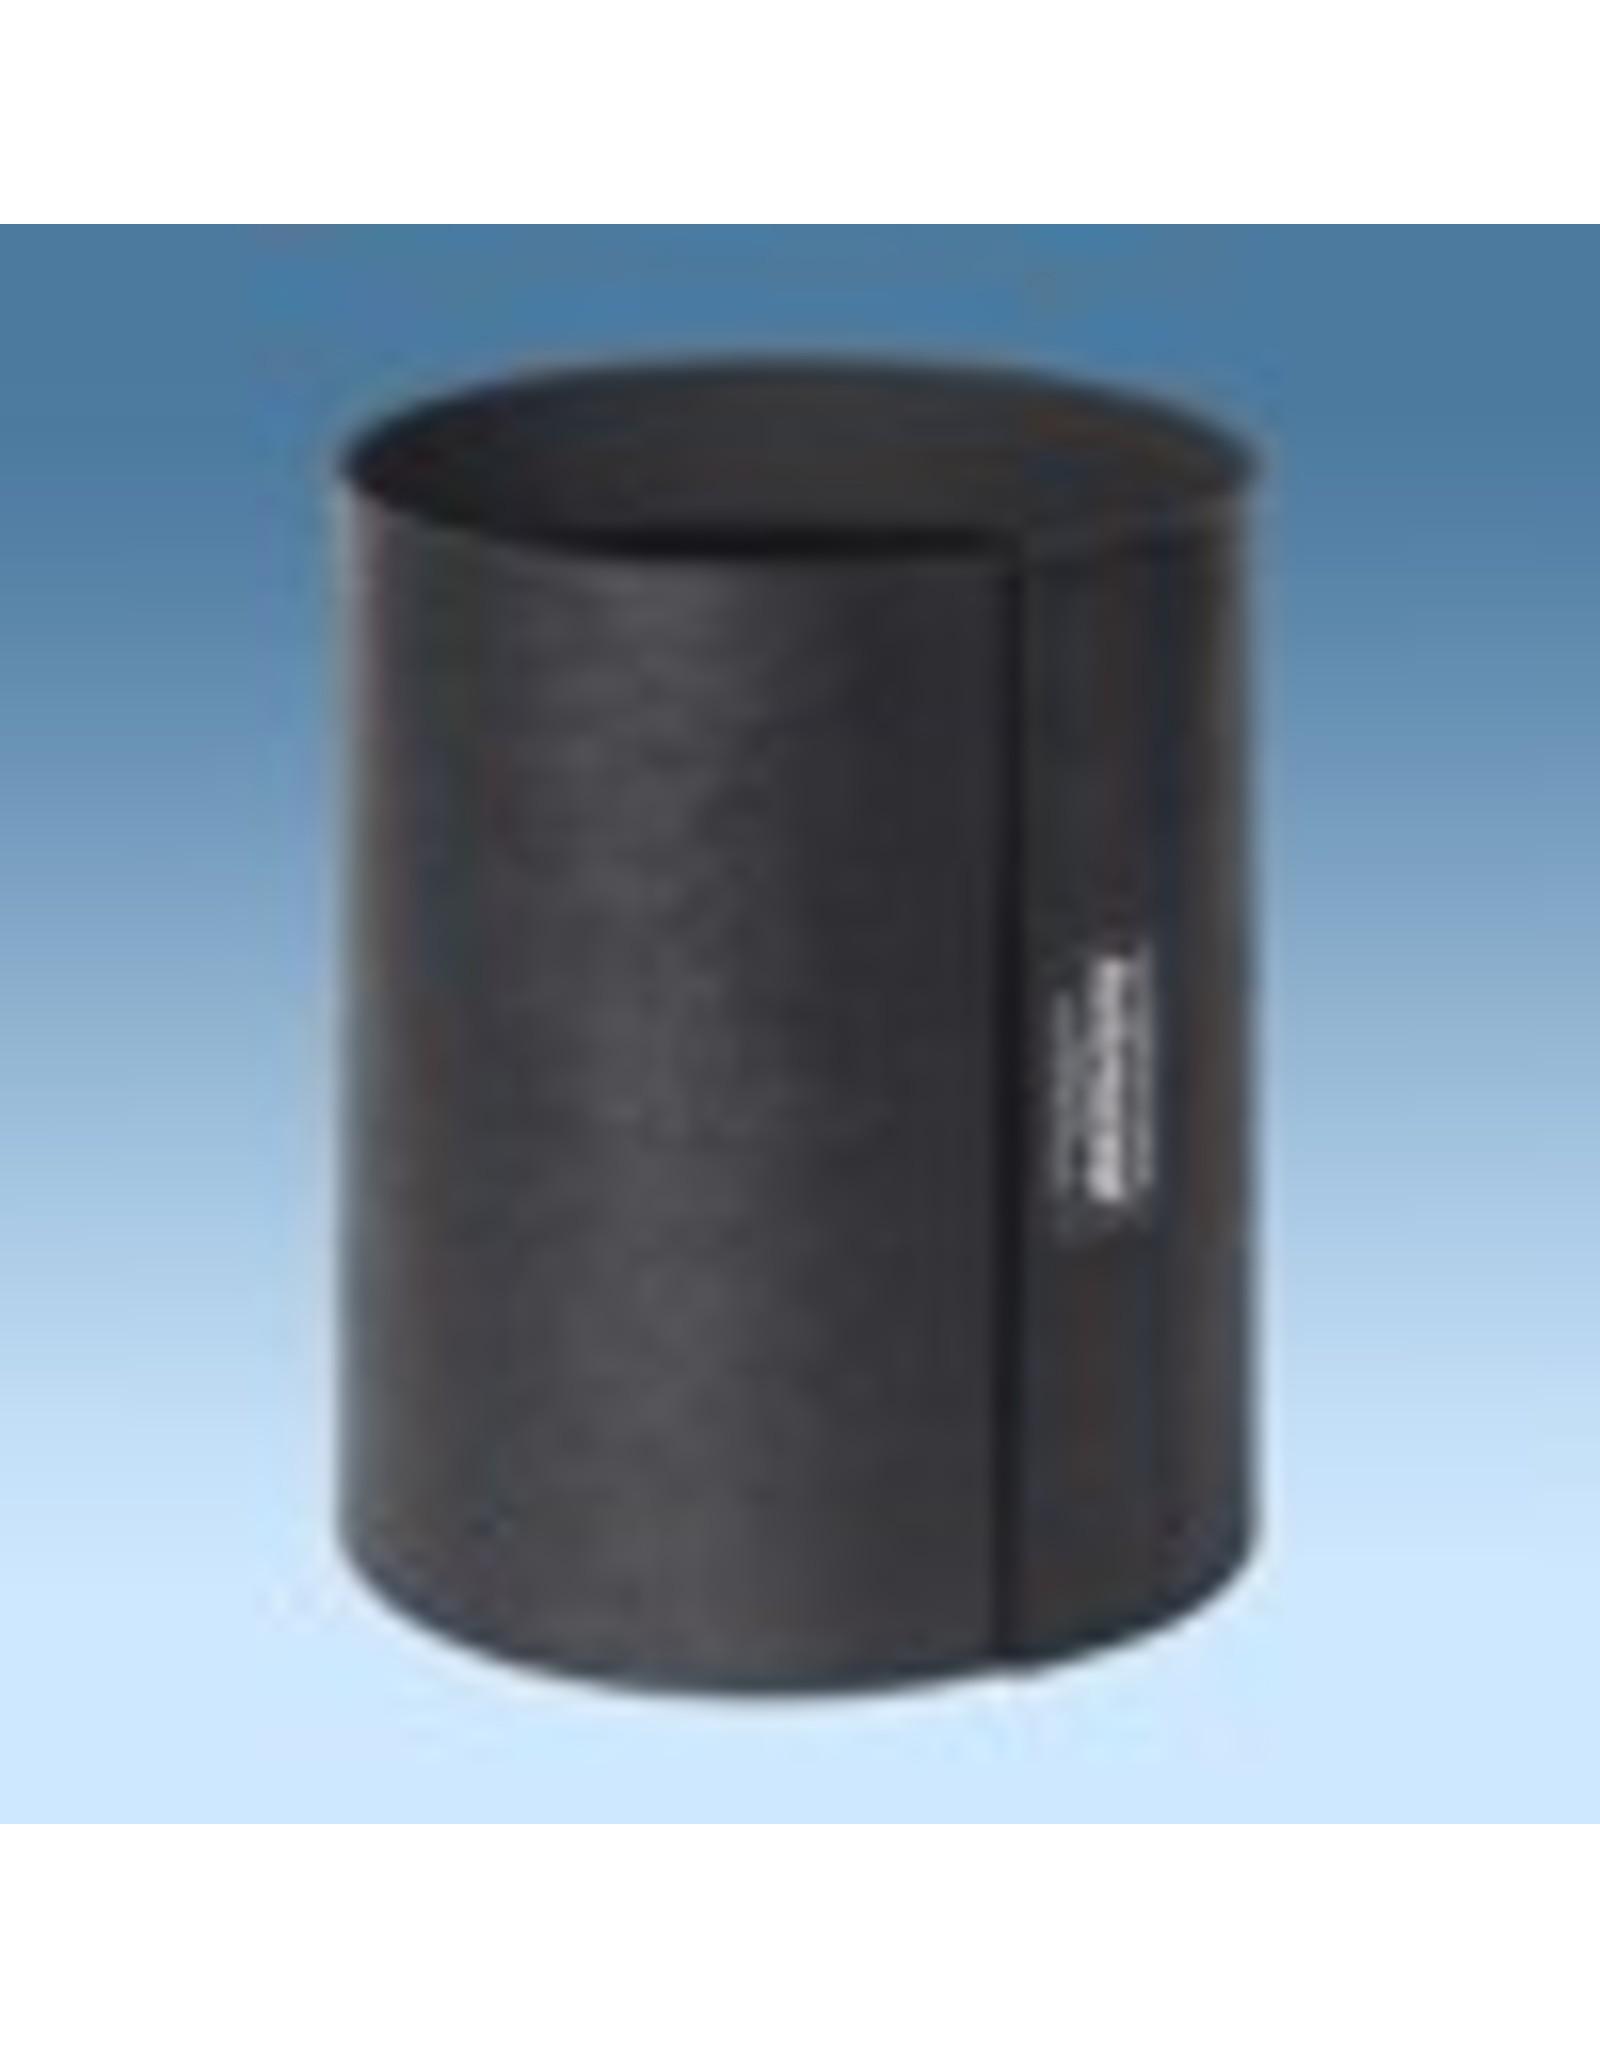 Astrozap Ioptron 150 Mak Flexi-Shield™ Flexible Dew Shield